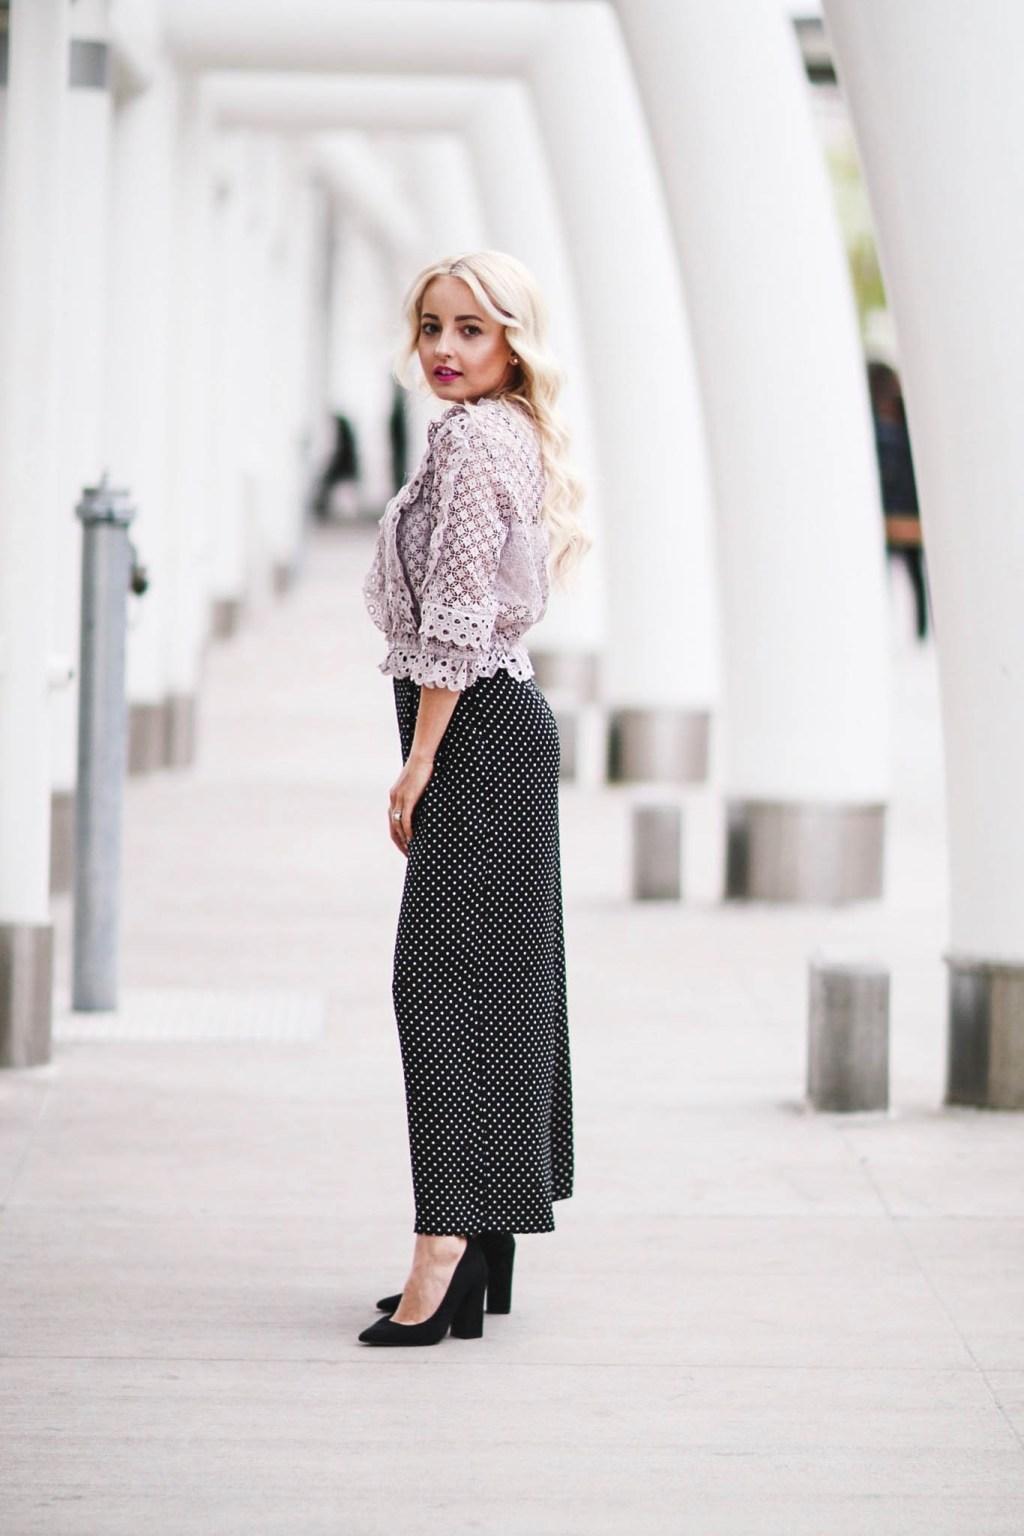 Alena Gidenko of modaprints.com styles polka dot trousers